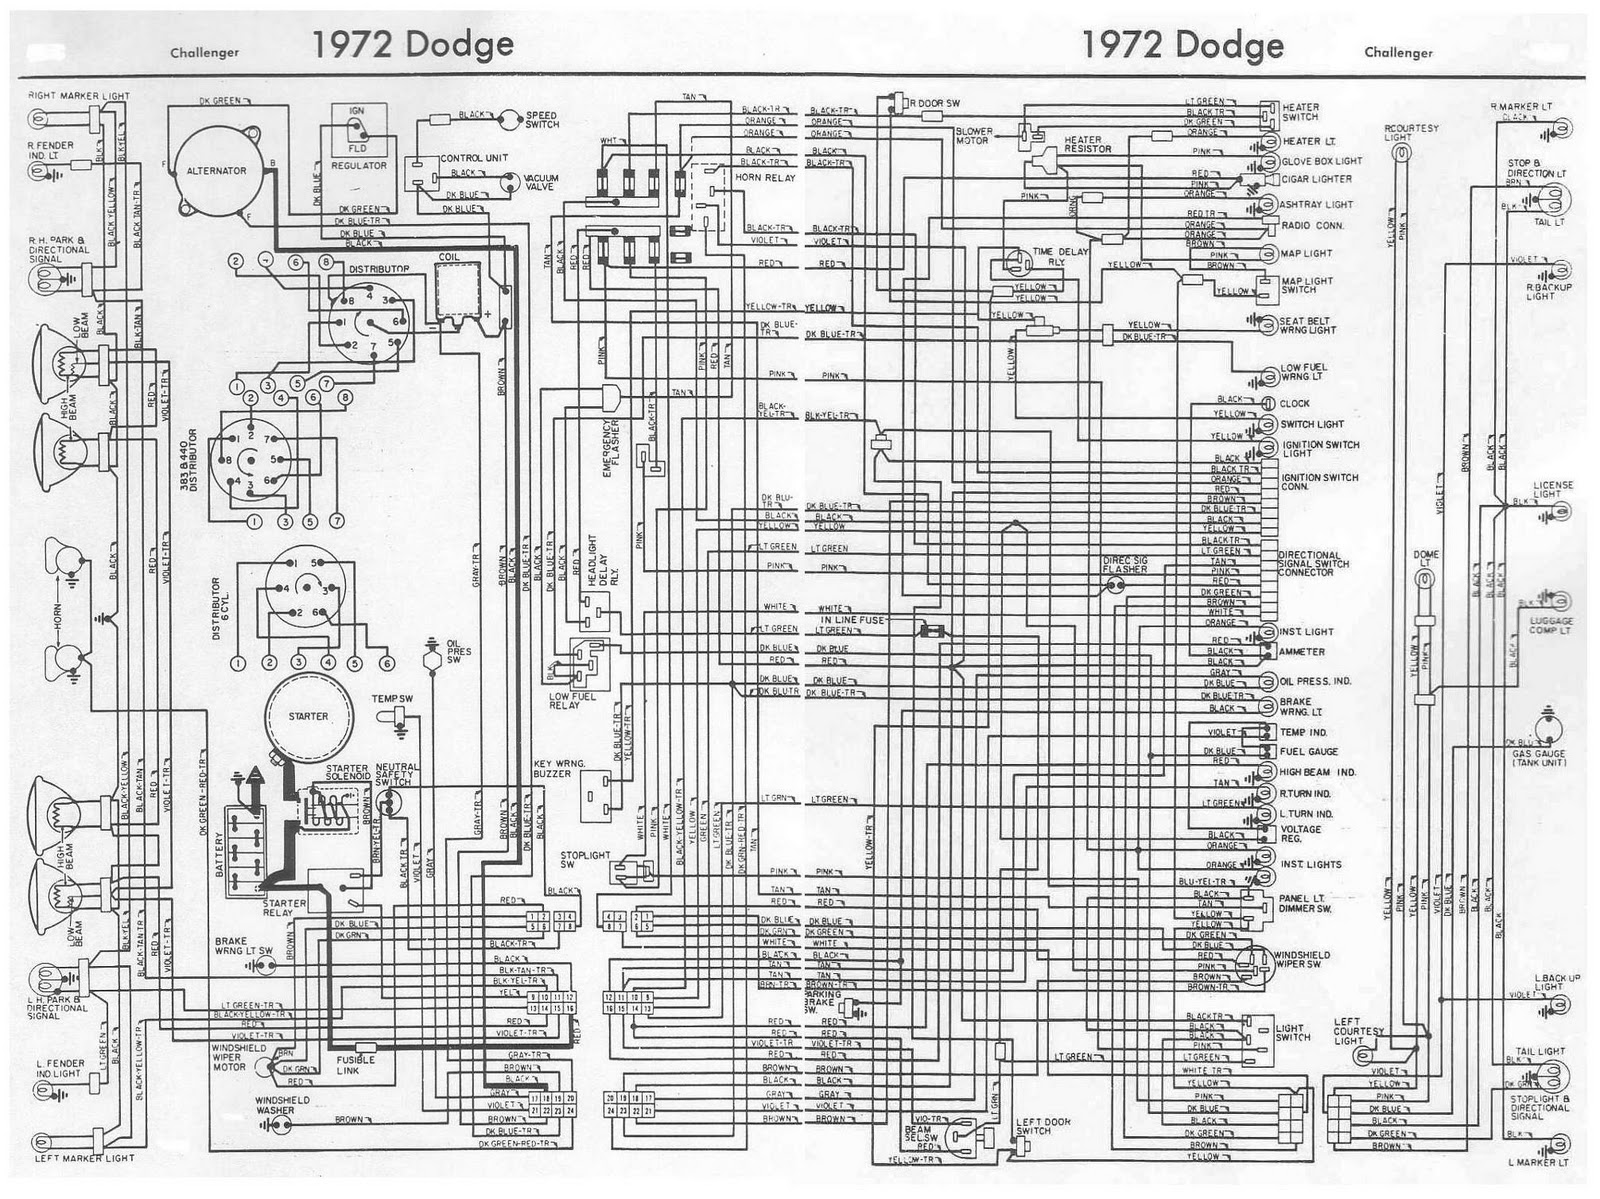 pin corolla headlight wiring diagram circuit schematics on corolla free